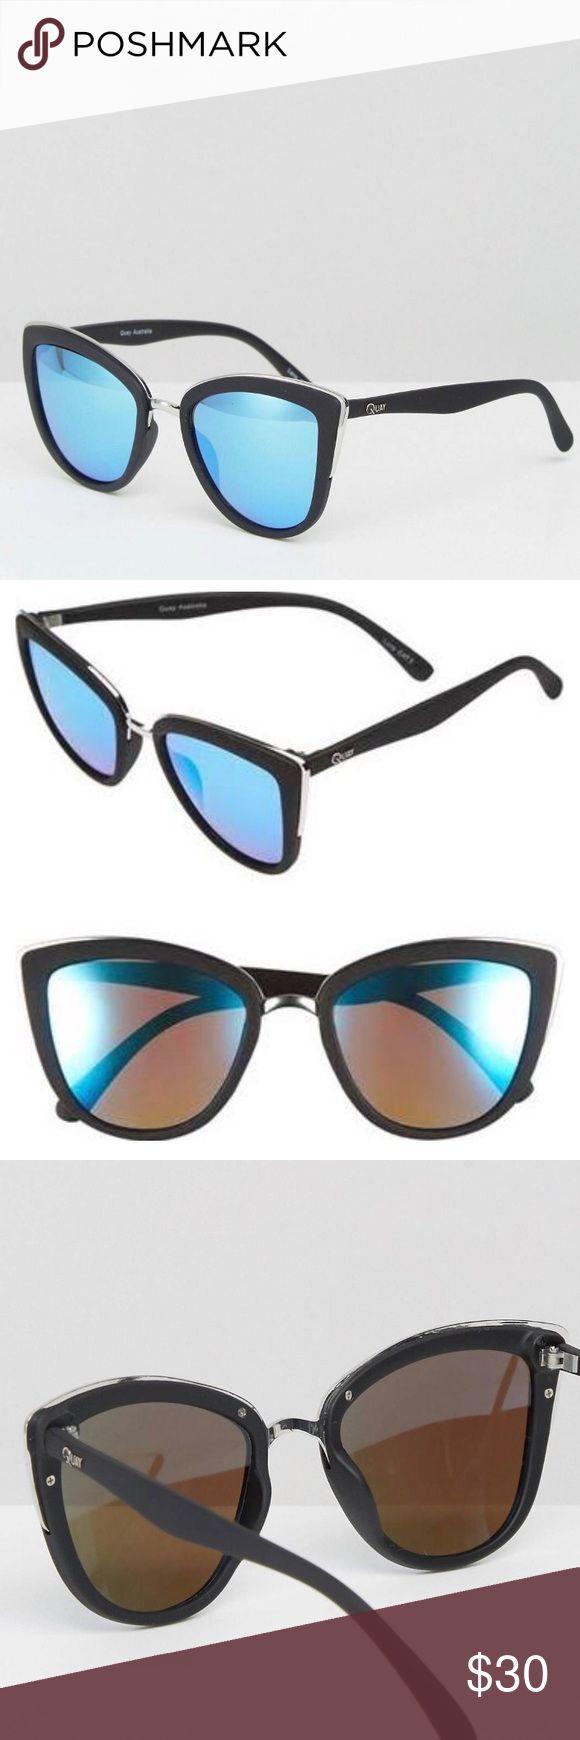 Quay Australian Sunglasses Quay Australian Sunglasses Quay Australia Accessories Sunglasses